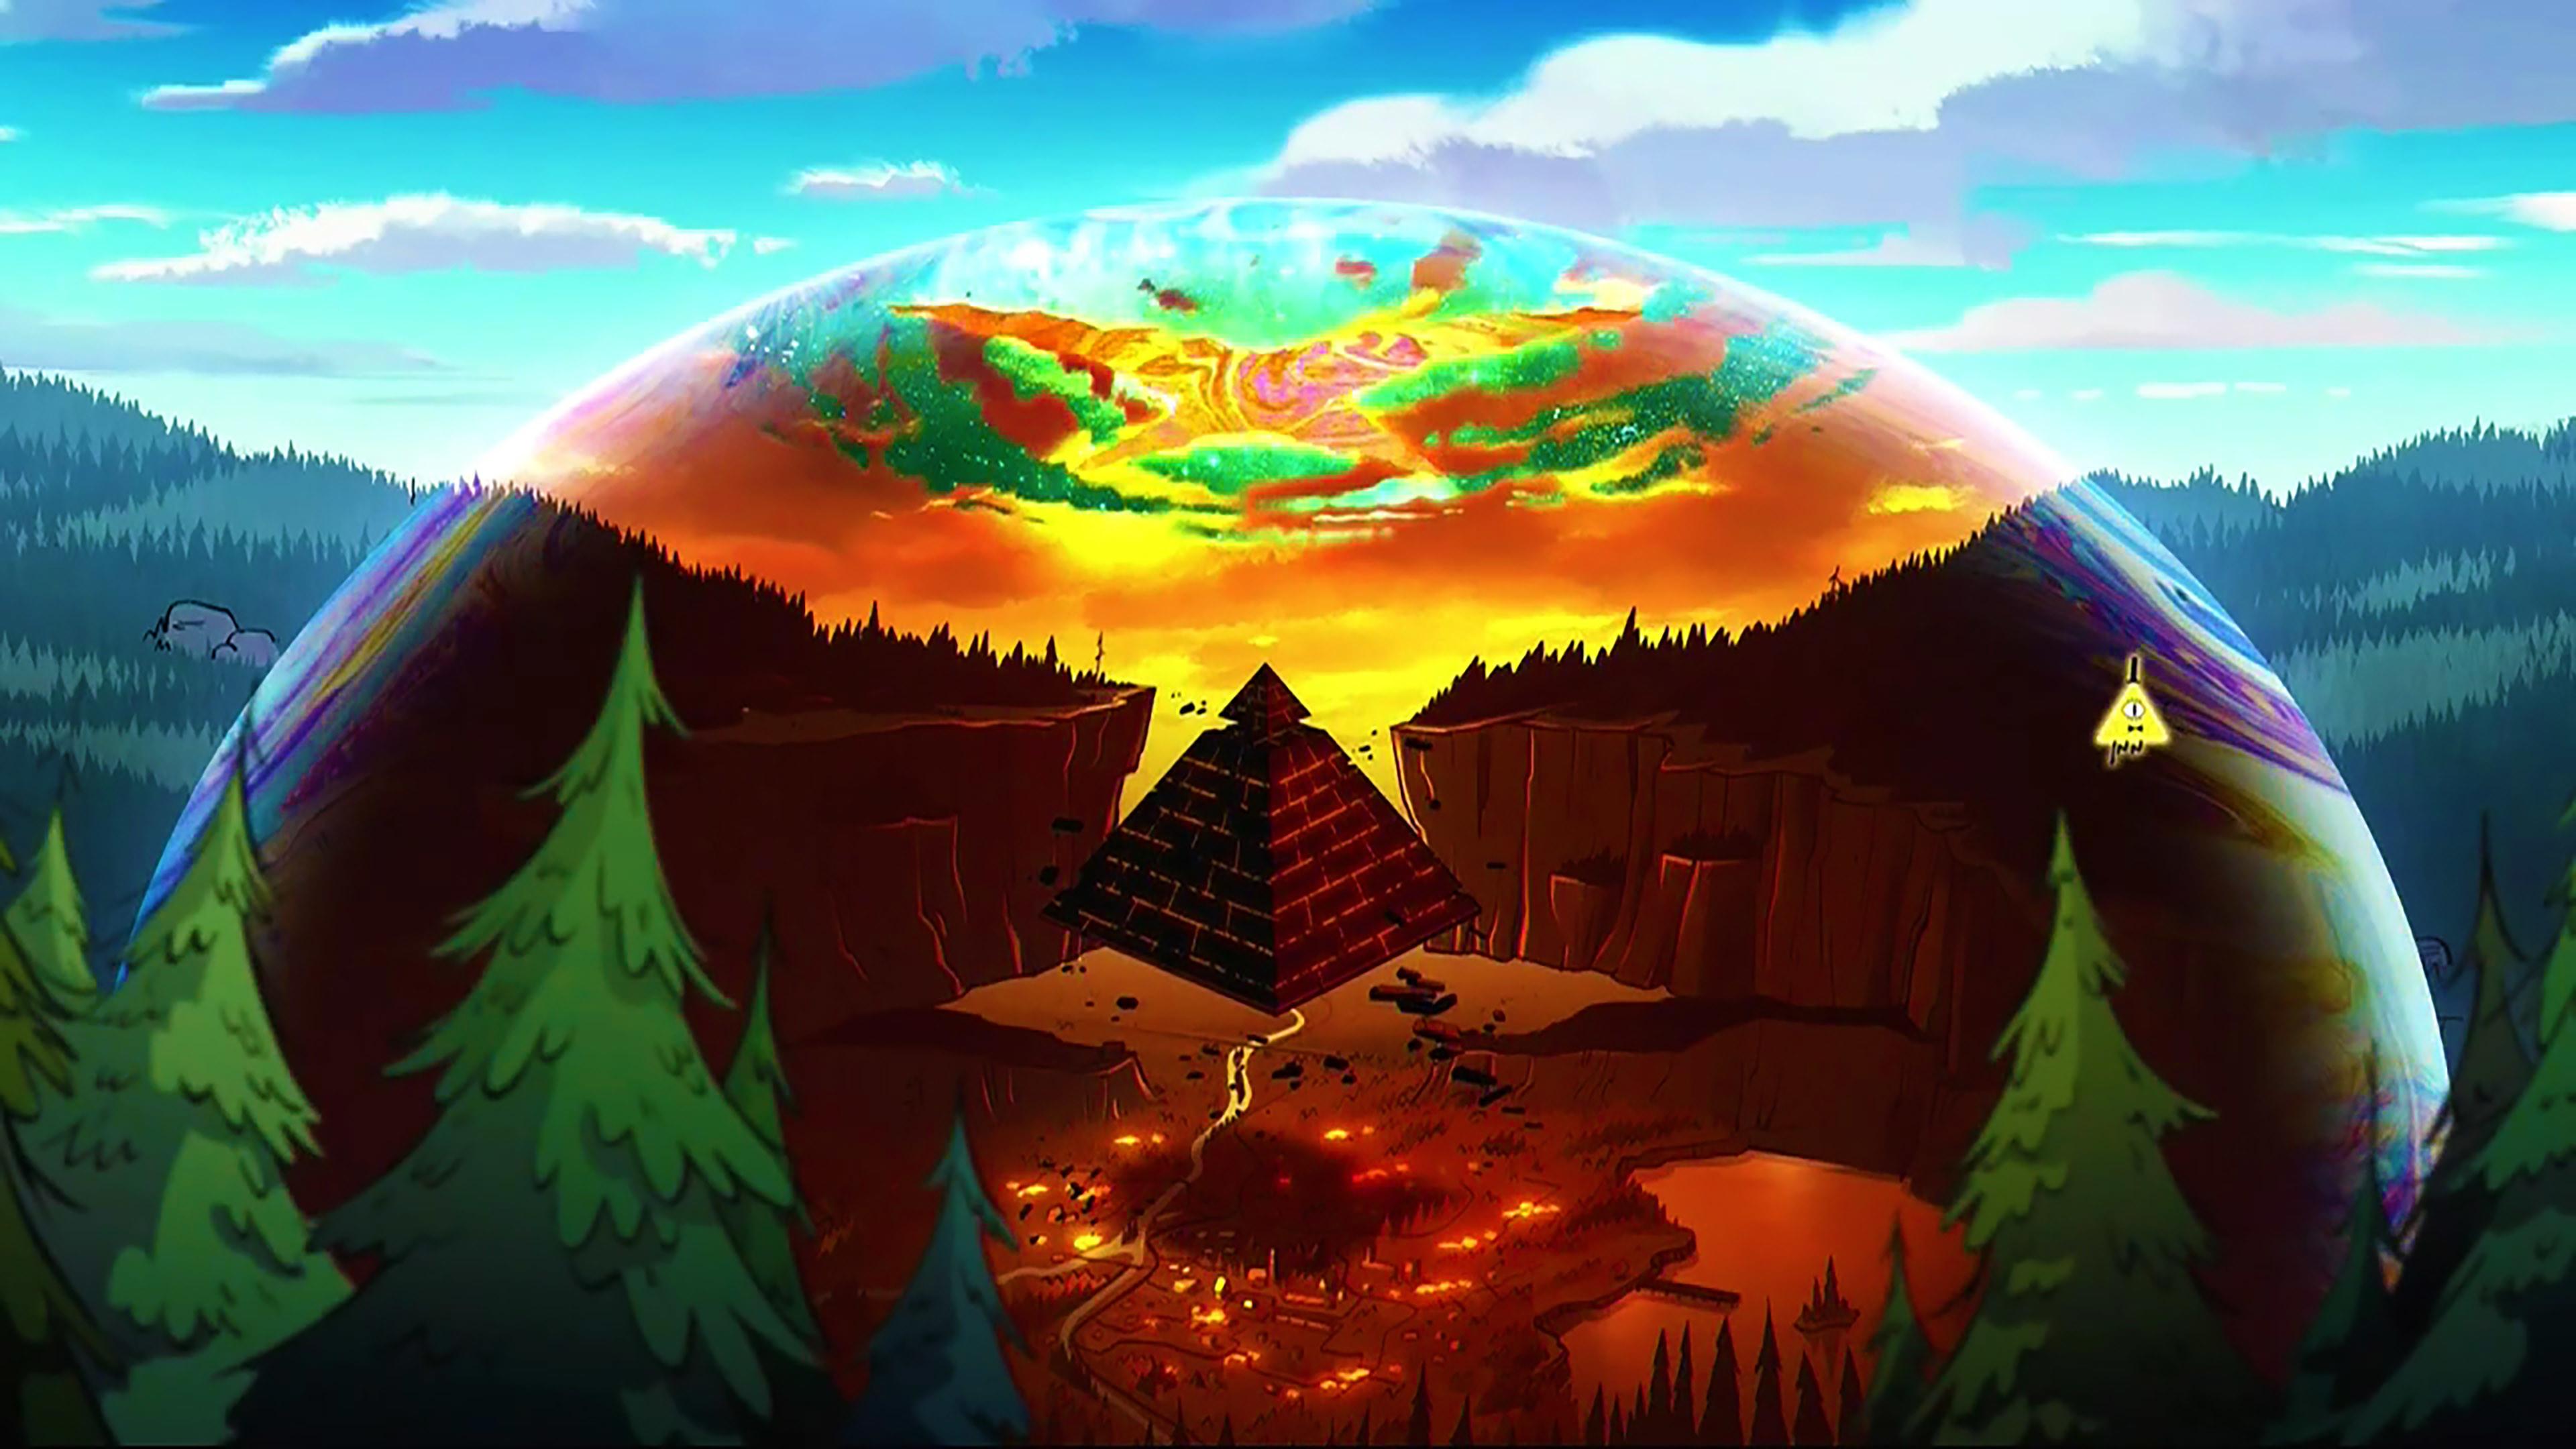 3d Live Wallpaper Mobile9 Gravity Falls Hd Wallpaper 65 Images